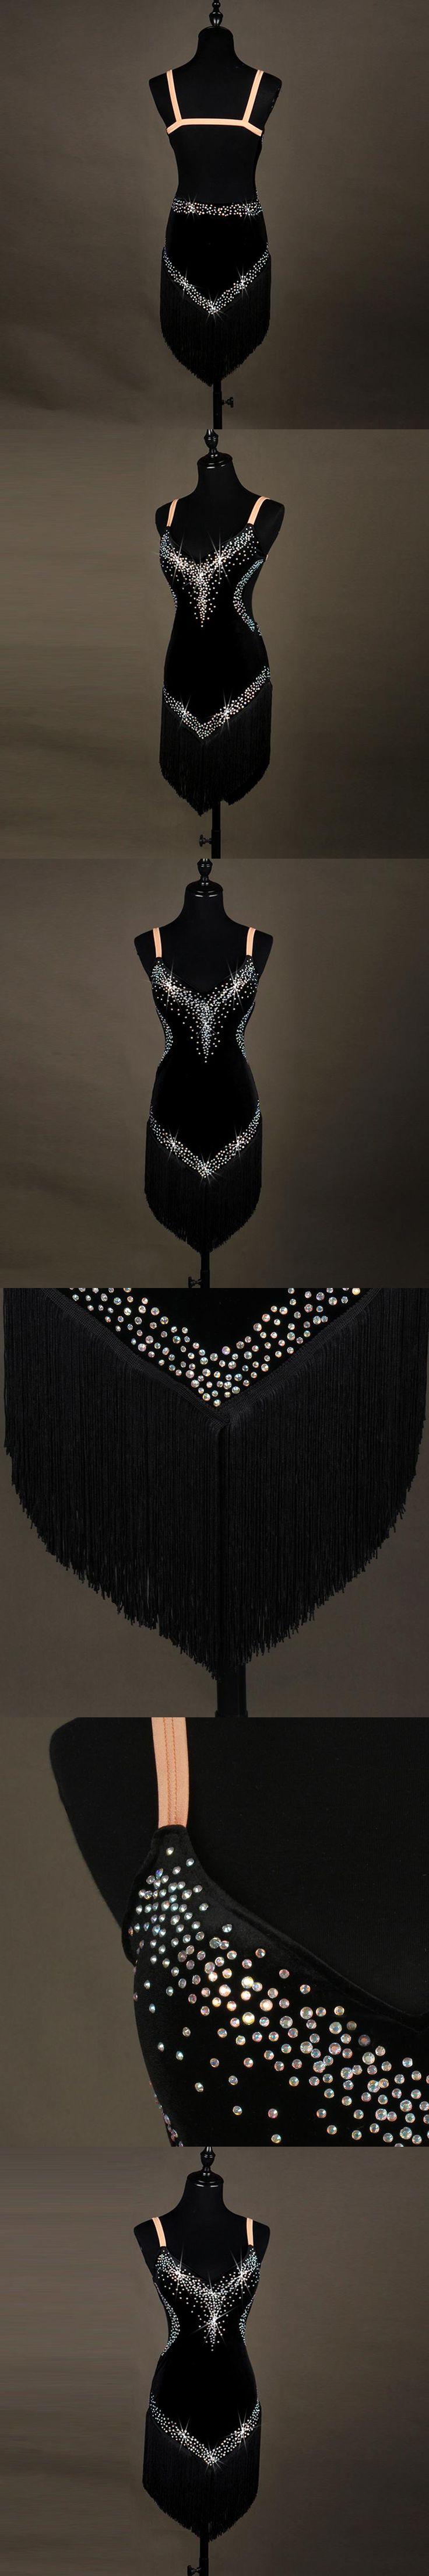 black tango dress ladies tassel latino dance dress samba latin dance costumes for women latin dresses for girls competition